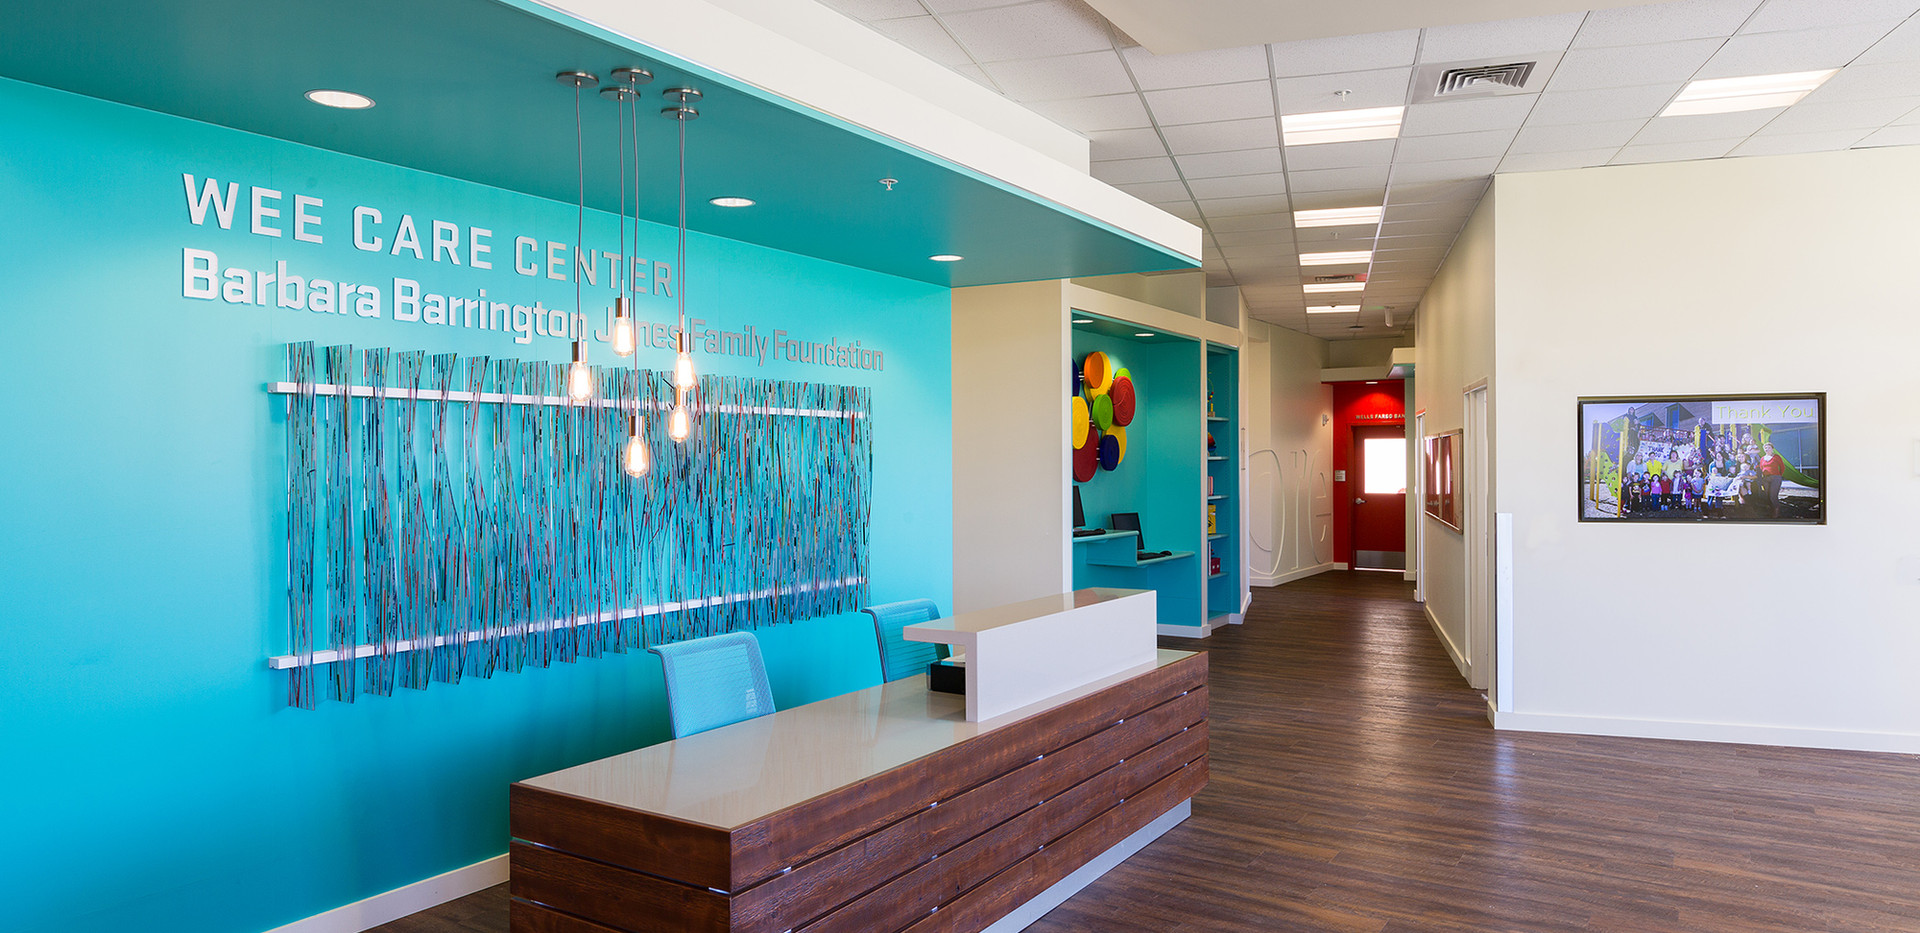 UVU Wee Care Center